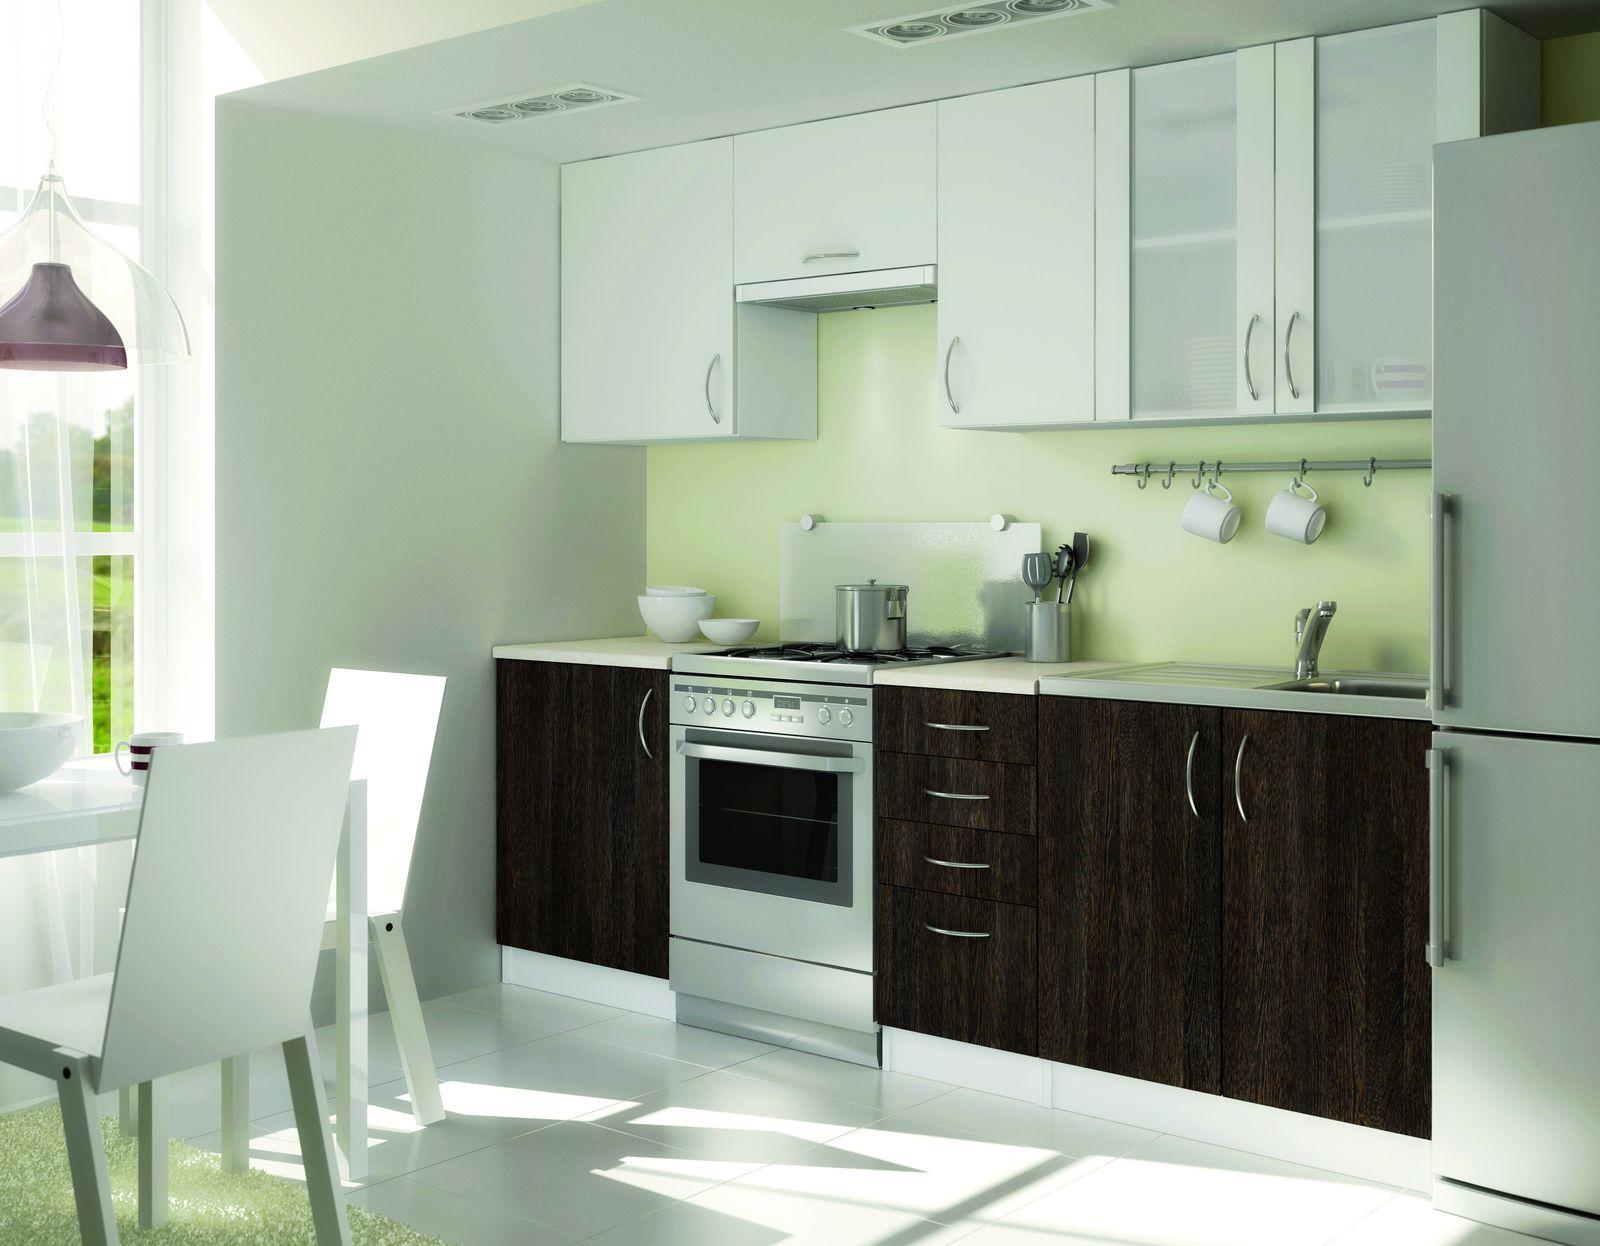 Kuchyně - Casarredo - Kenya 240 cm